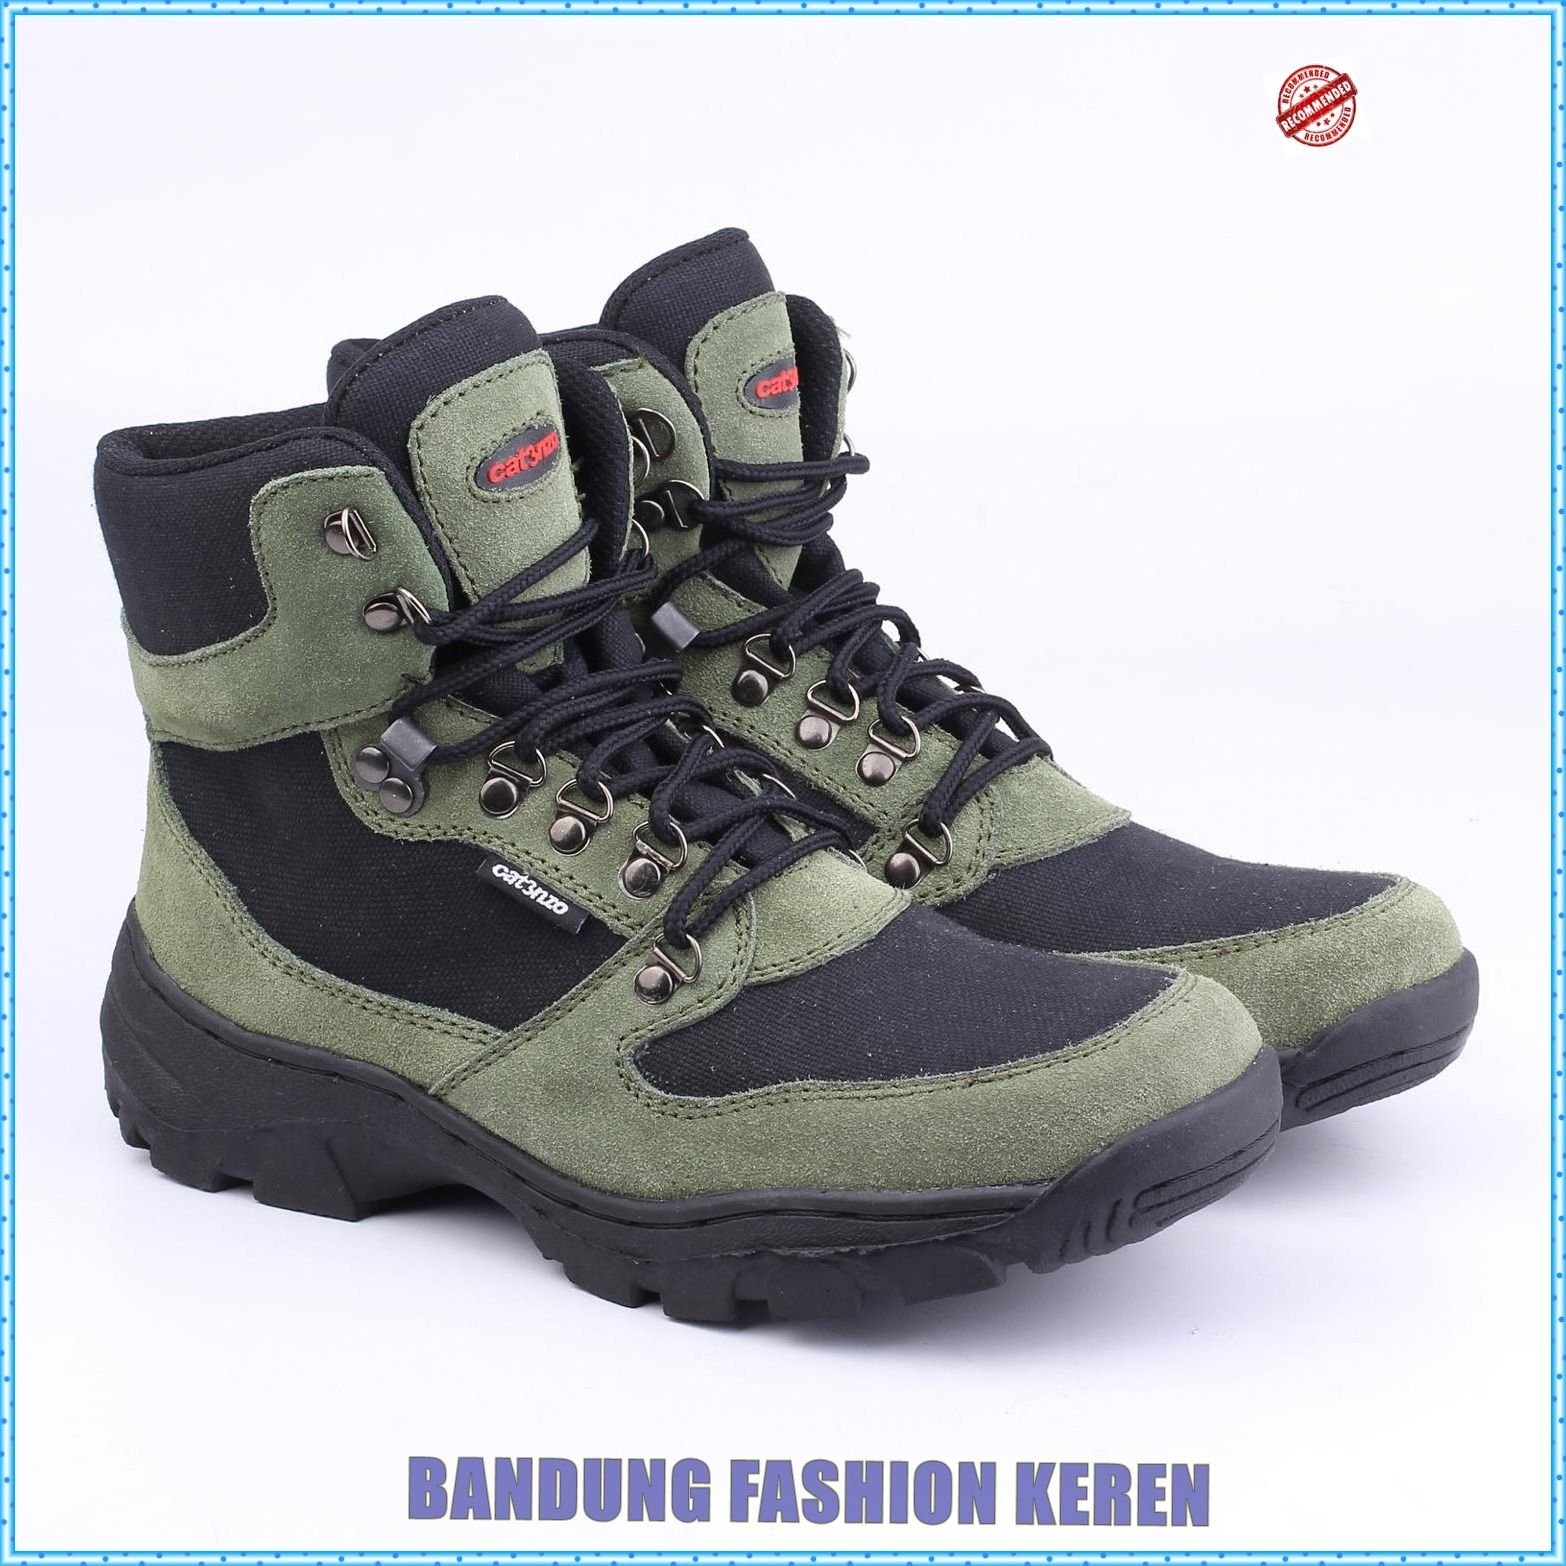 Sepatu Hiking Pria Rr 002 Produk Fashion Handmade Terbaik 100